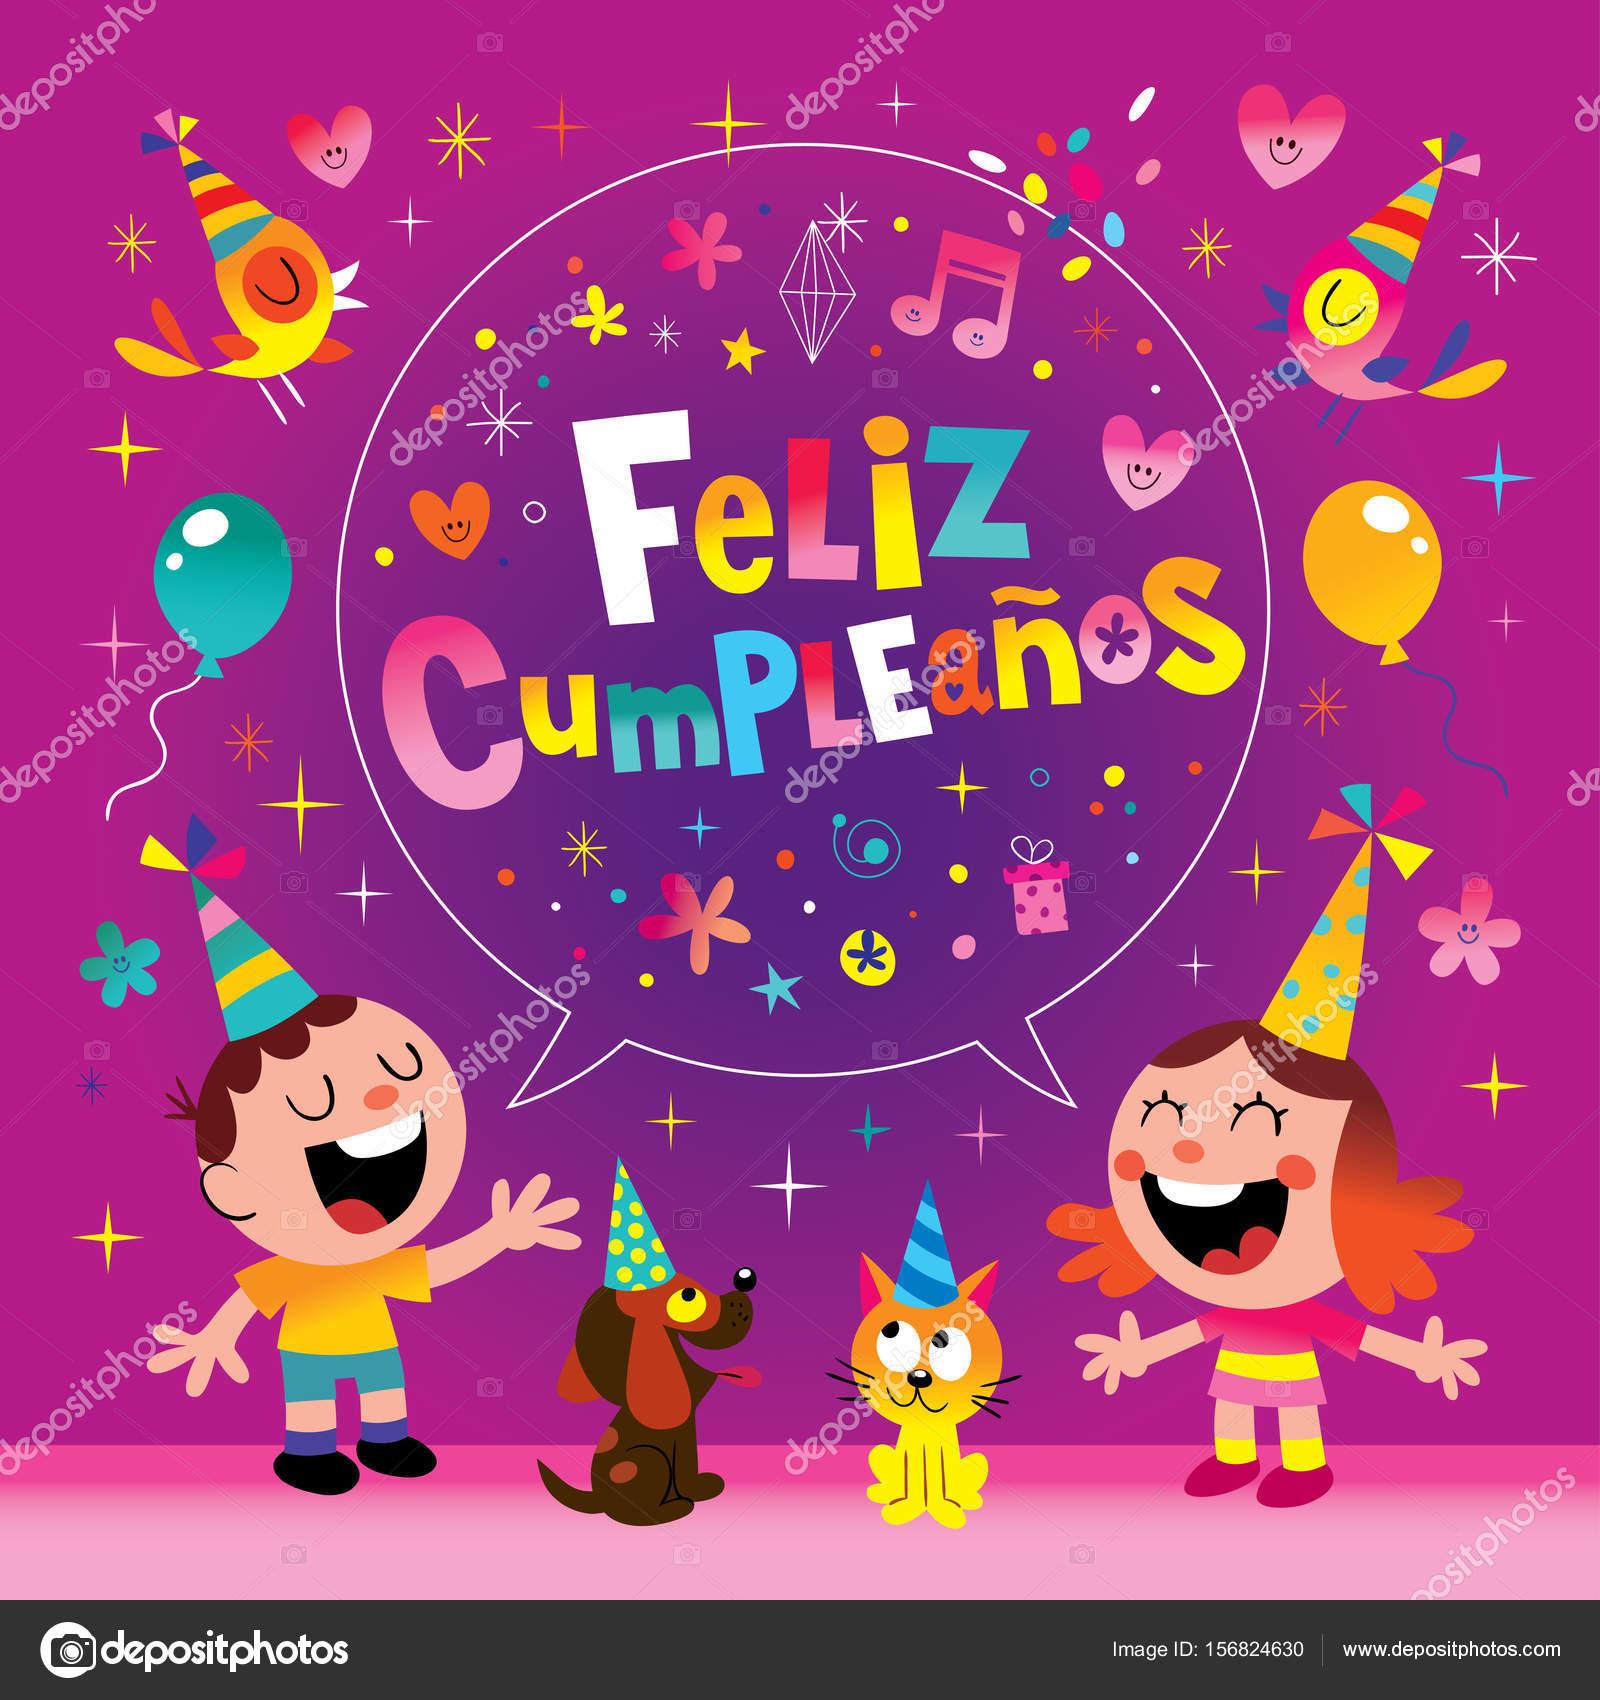 Feliz Cumpleanos   buon compleanno in spagnolo per bambini